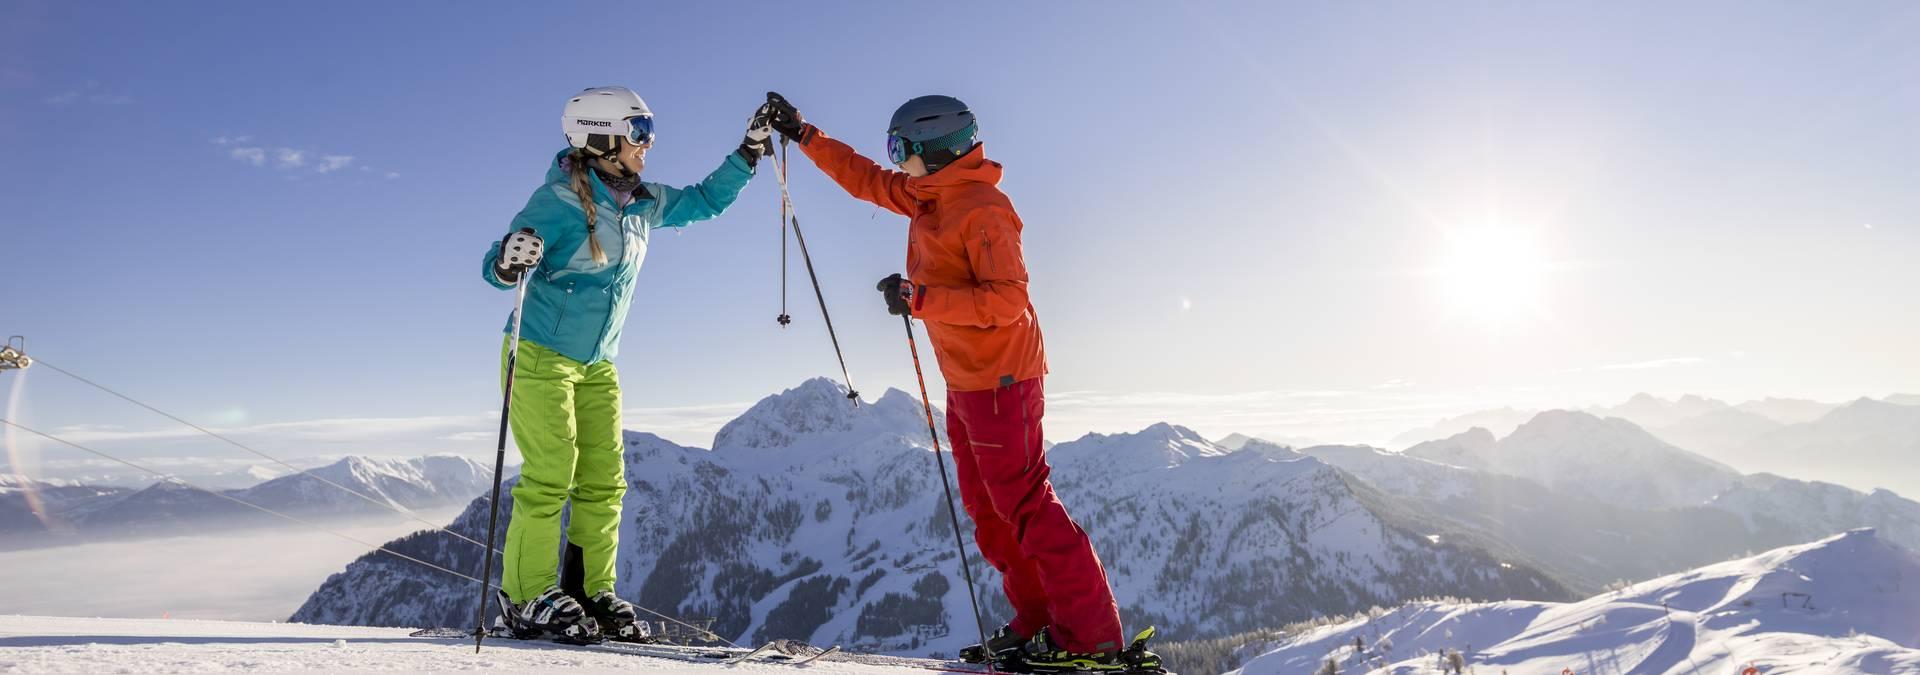 Nassfeld_Winter_Ski Alpin